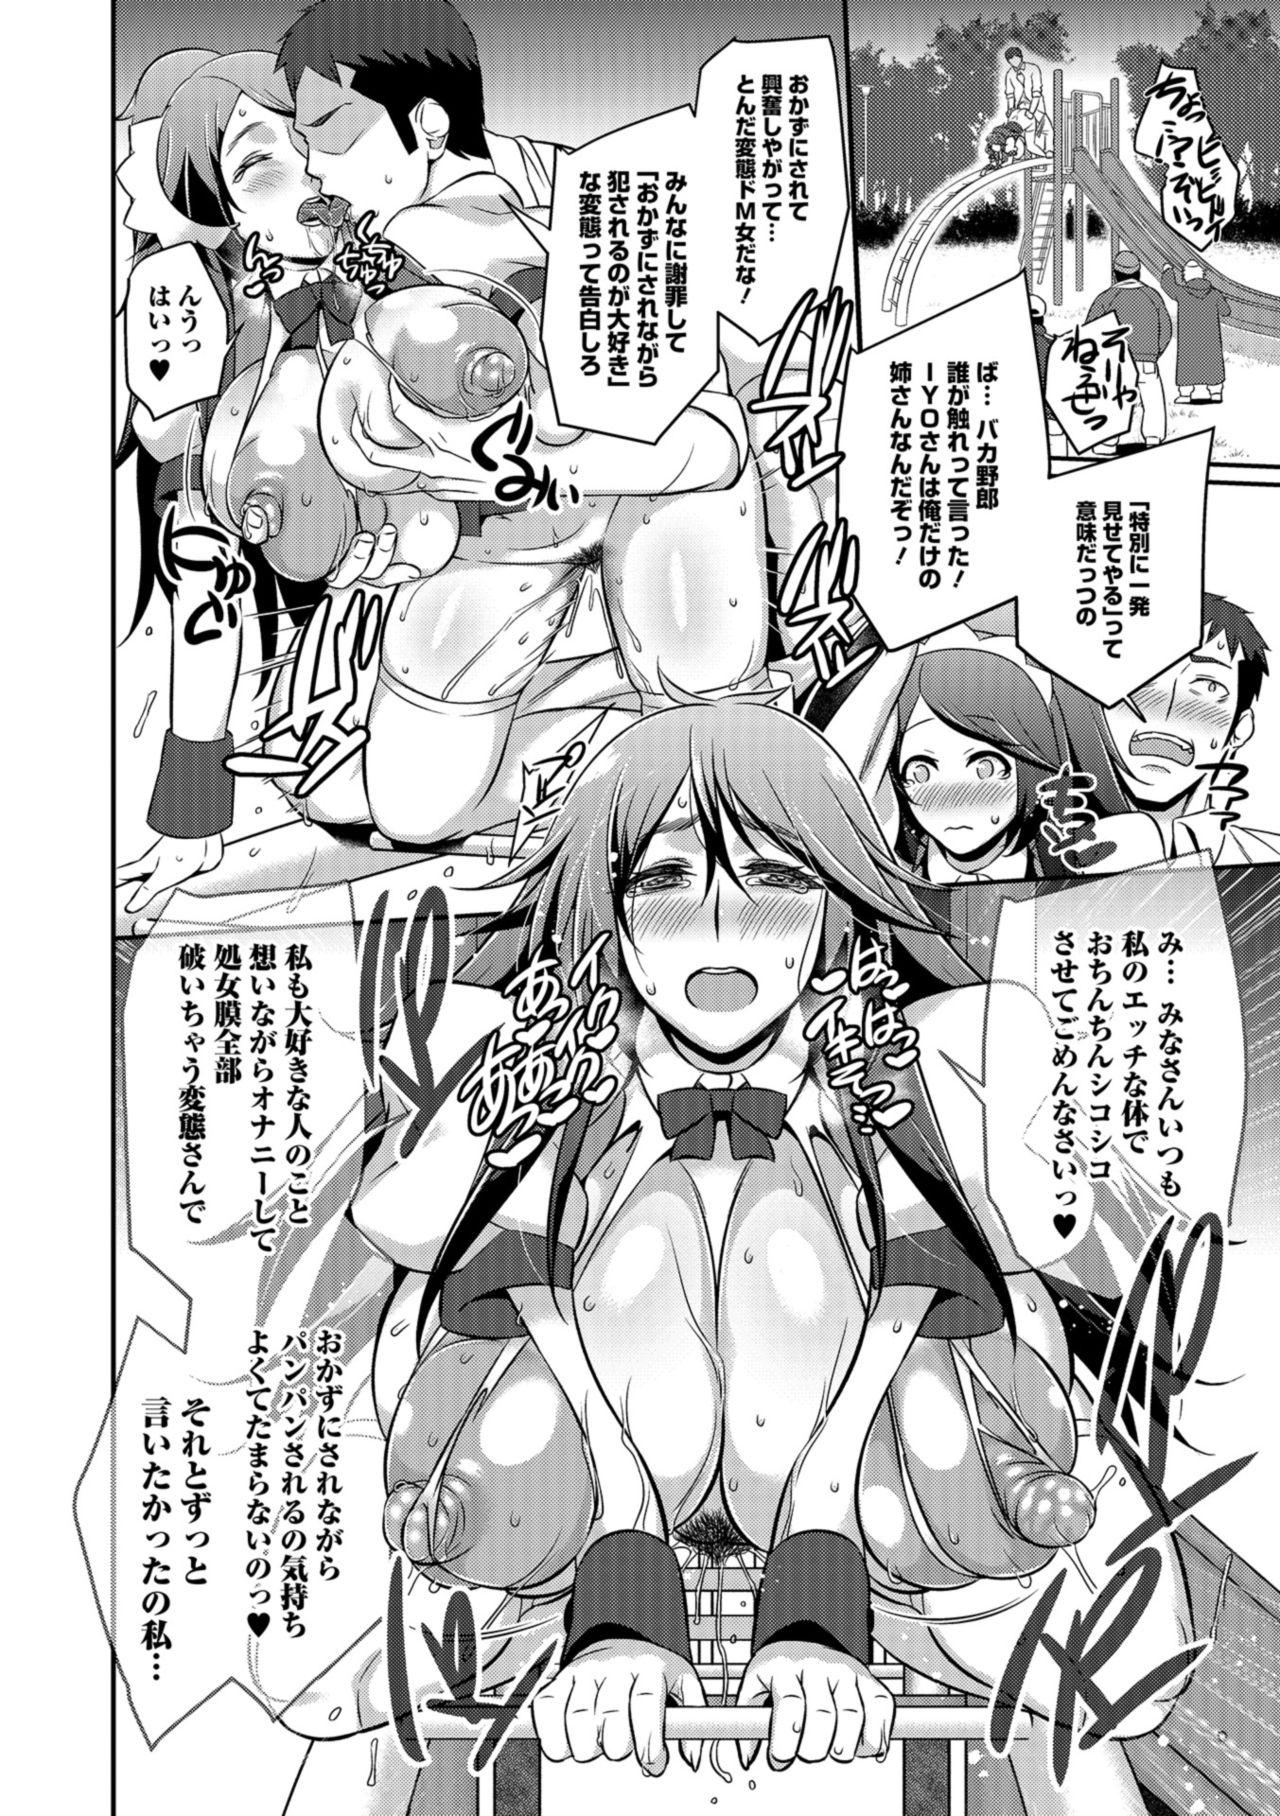 COMIC Shigekiteki SQUIRT!! Vol. 09 231